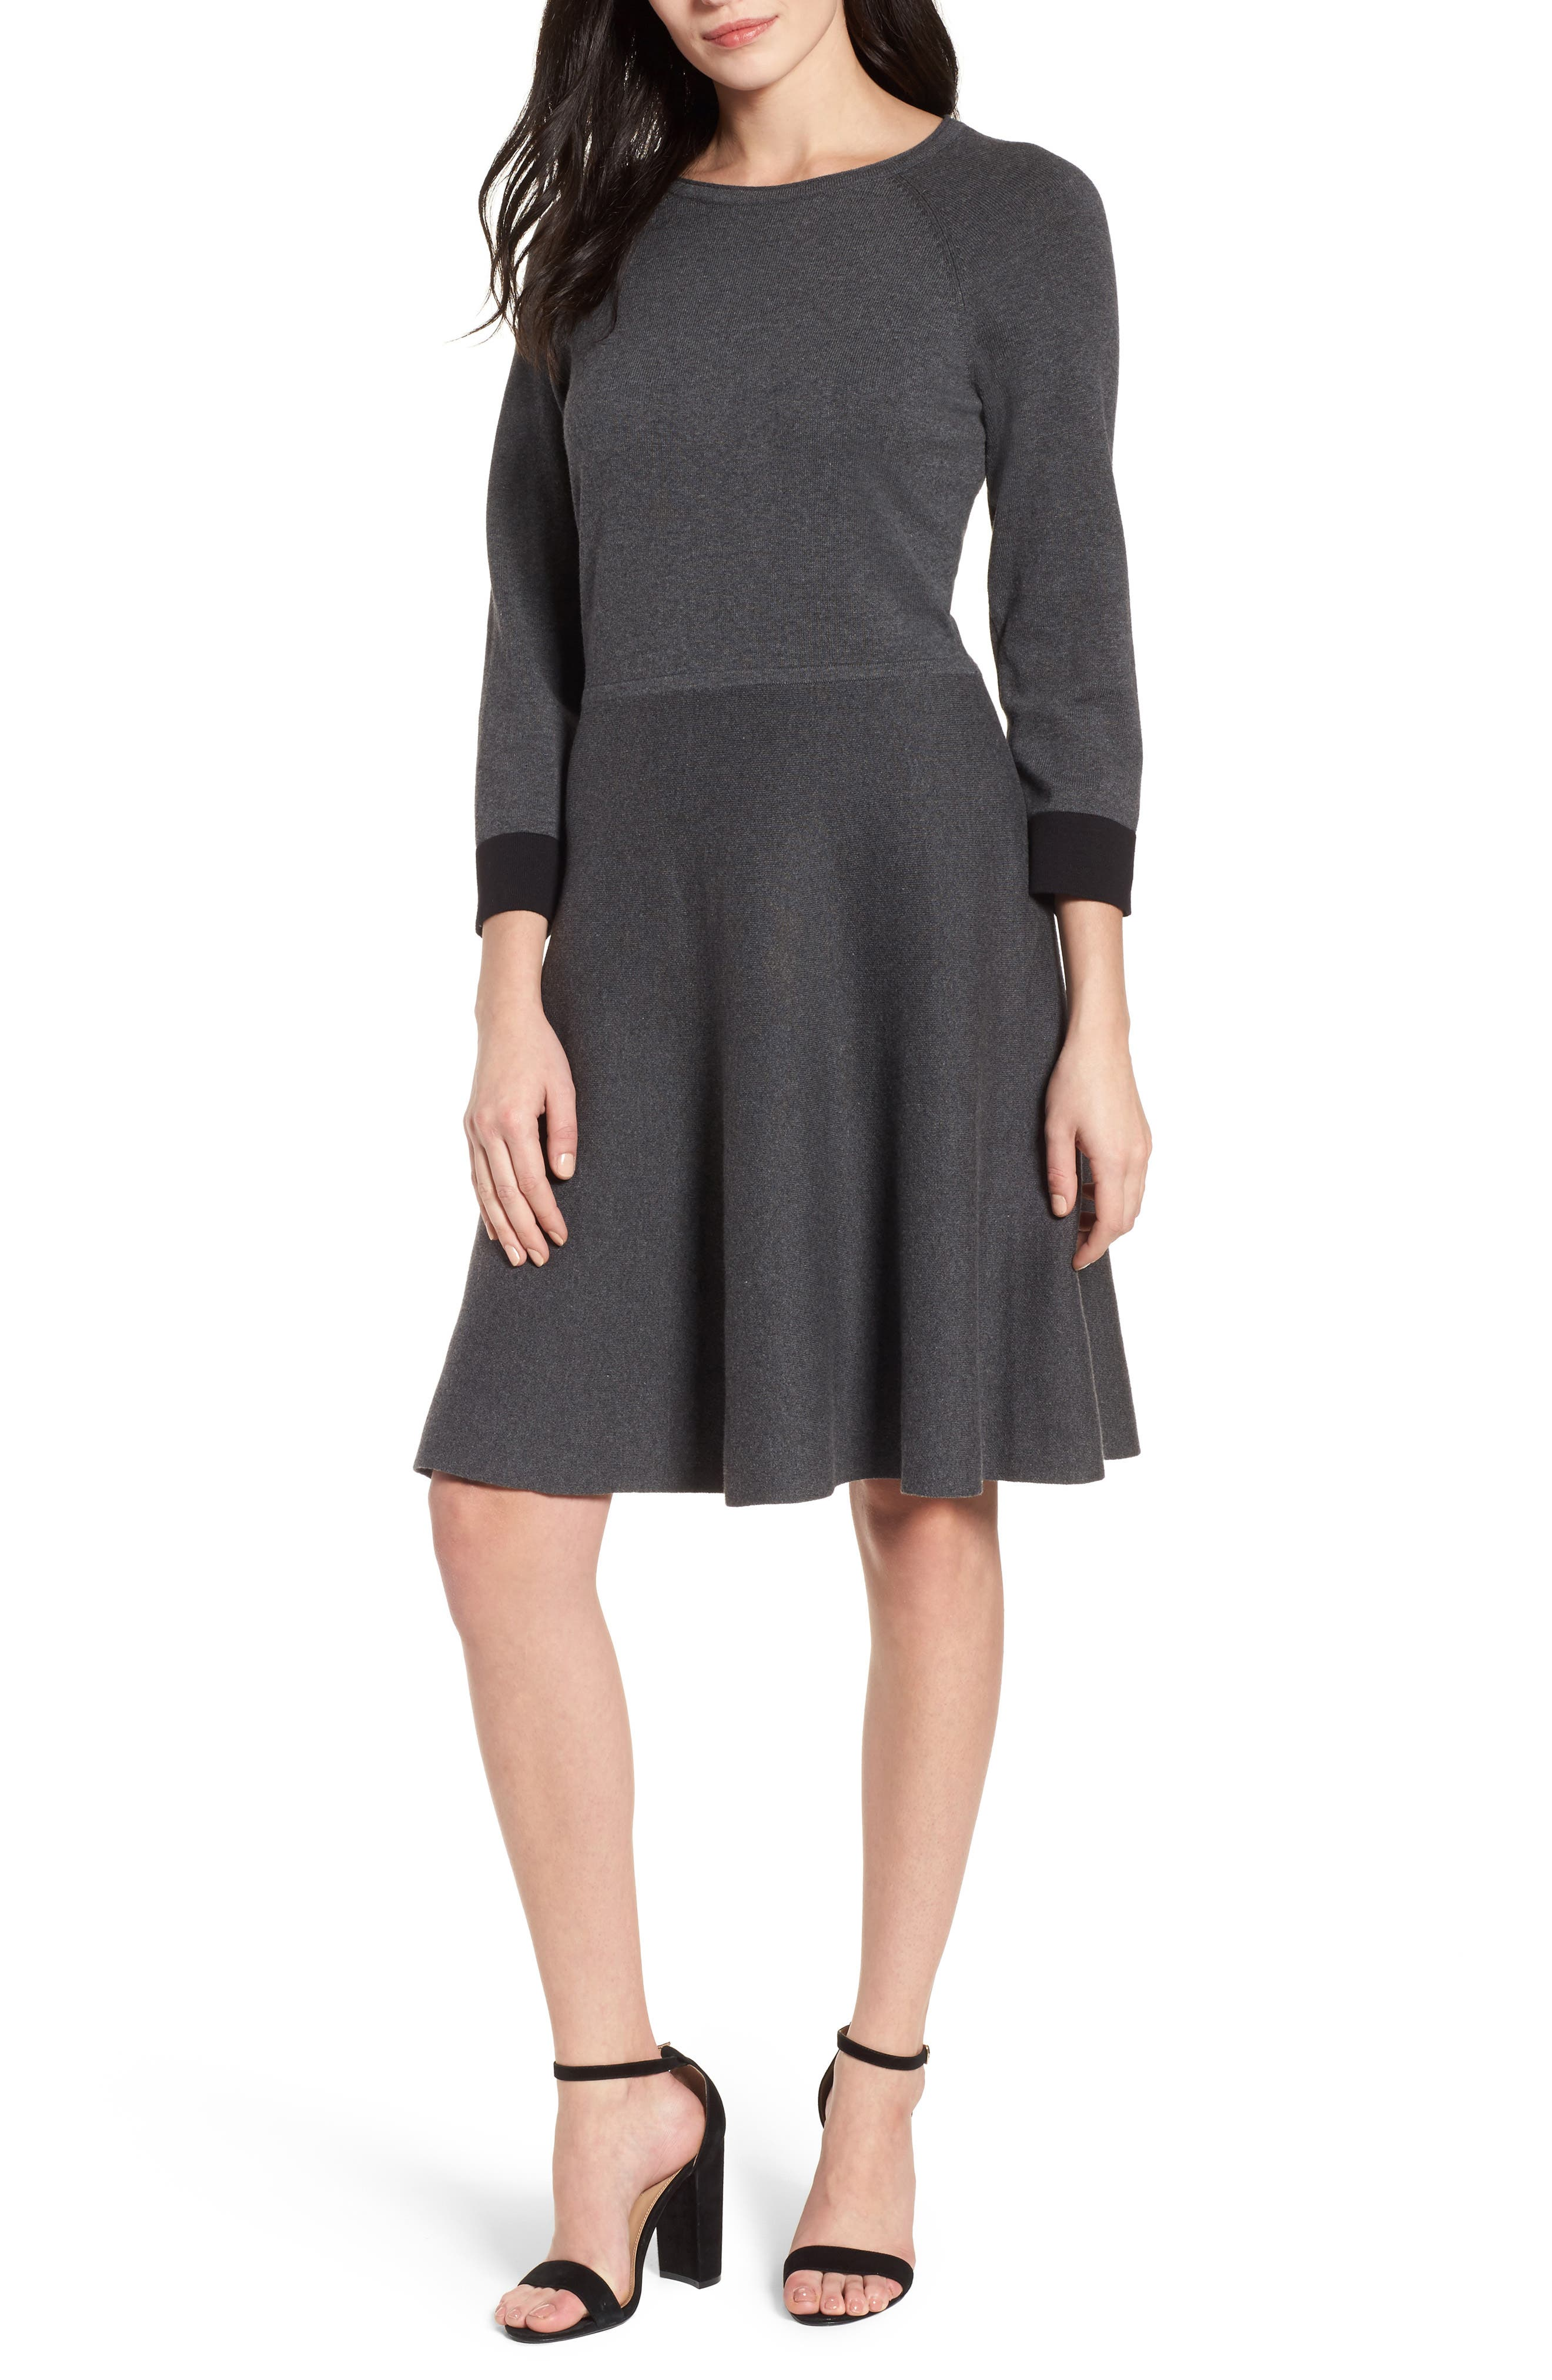 Main Image - Vince Camuto Fit & Flare Sweater Dress (Regular & Petite)